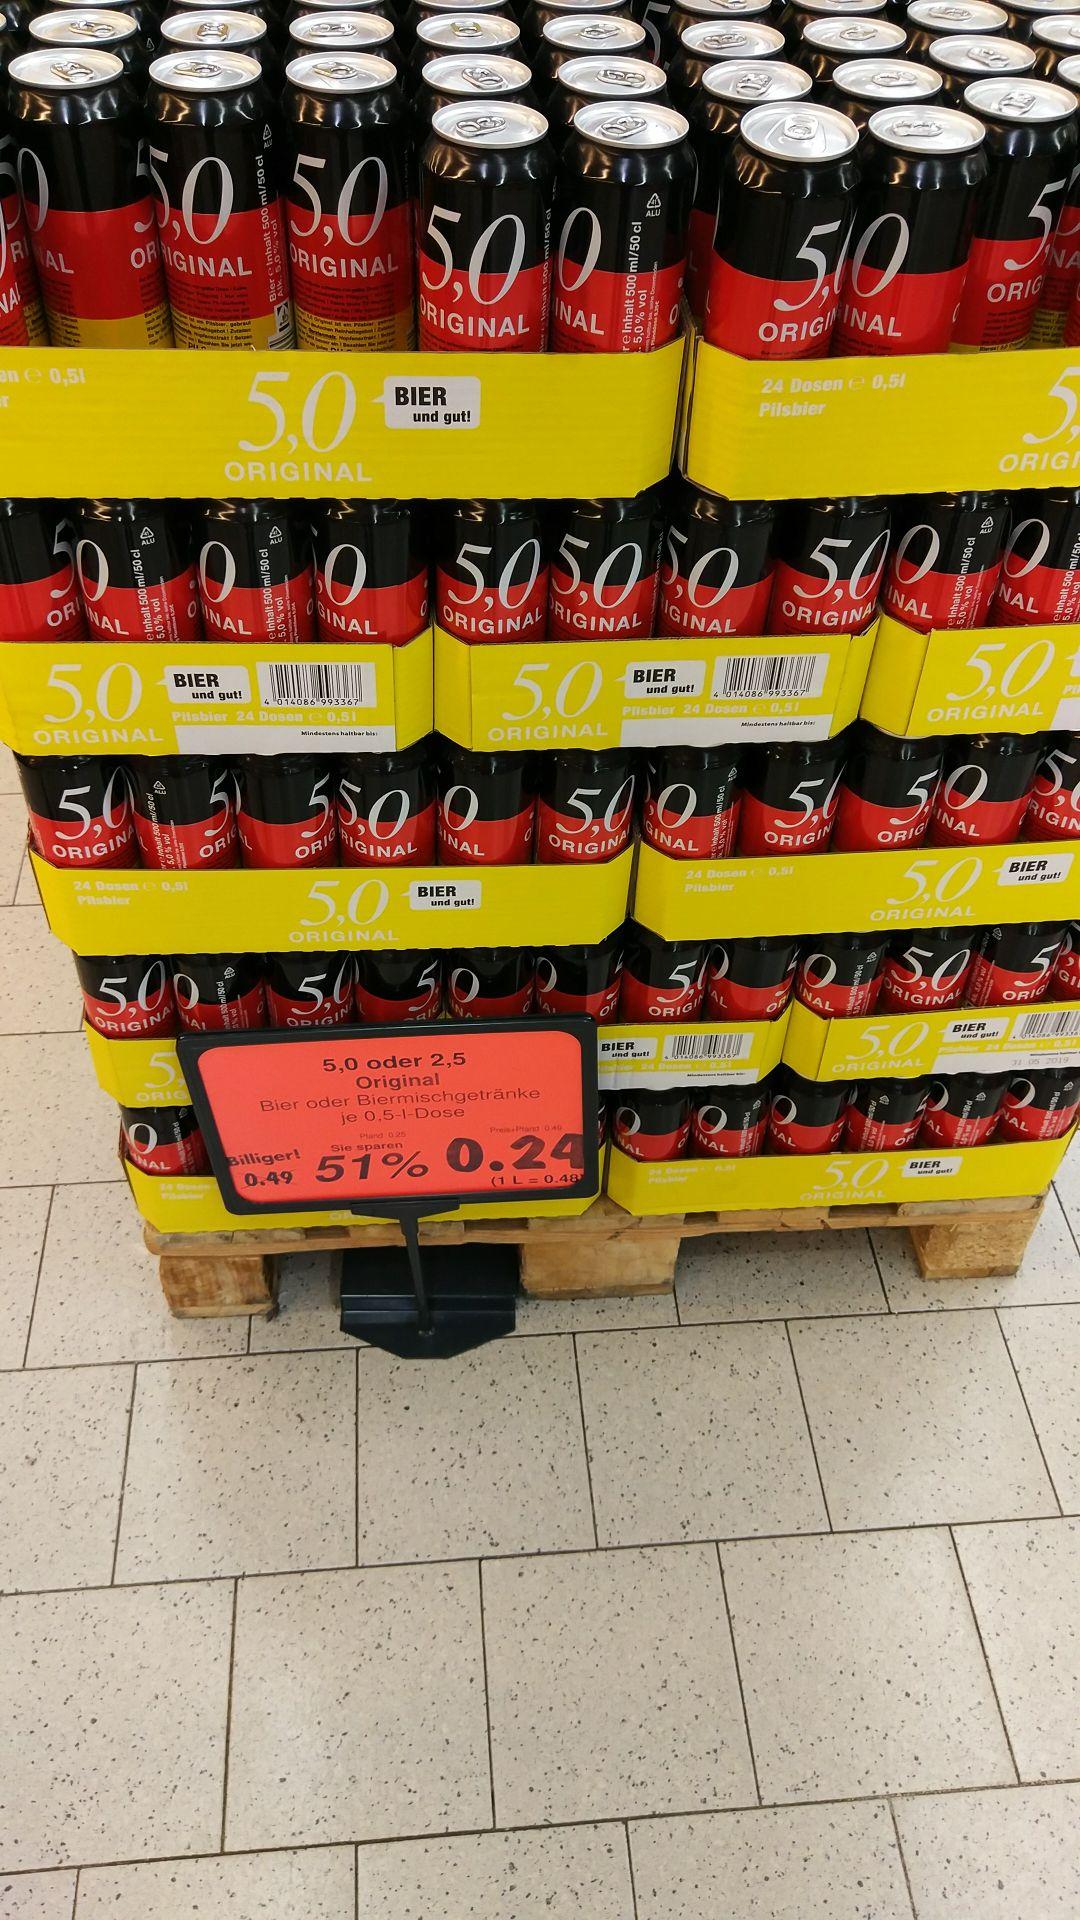 [Lokal] 5,0 *Belgien* Bier im Kaufland Duisburg-Hamborn